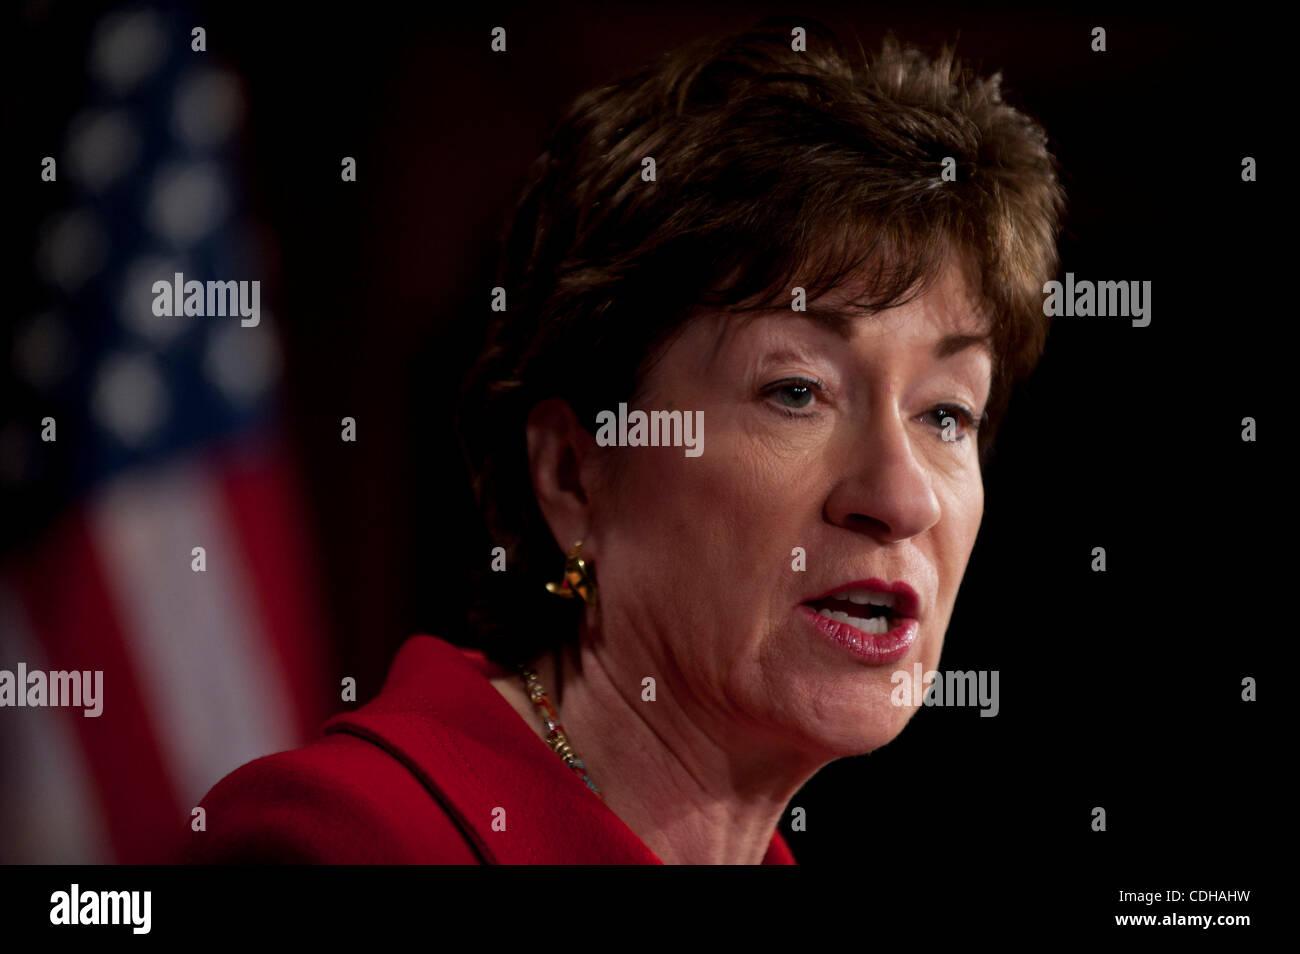 Feb 1, 2011 - Washington, District of Columbia, U.S. - Senator SUSAN COLLINS, (R-MA) during a news conference to Stock Photo